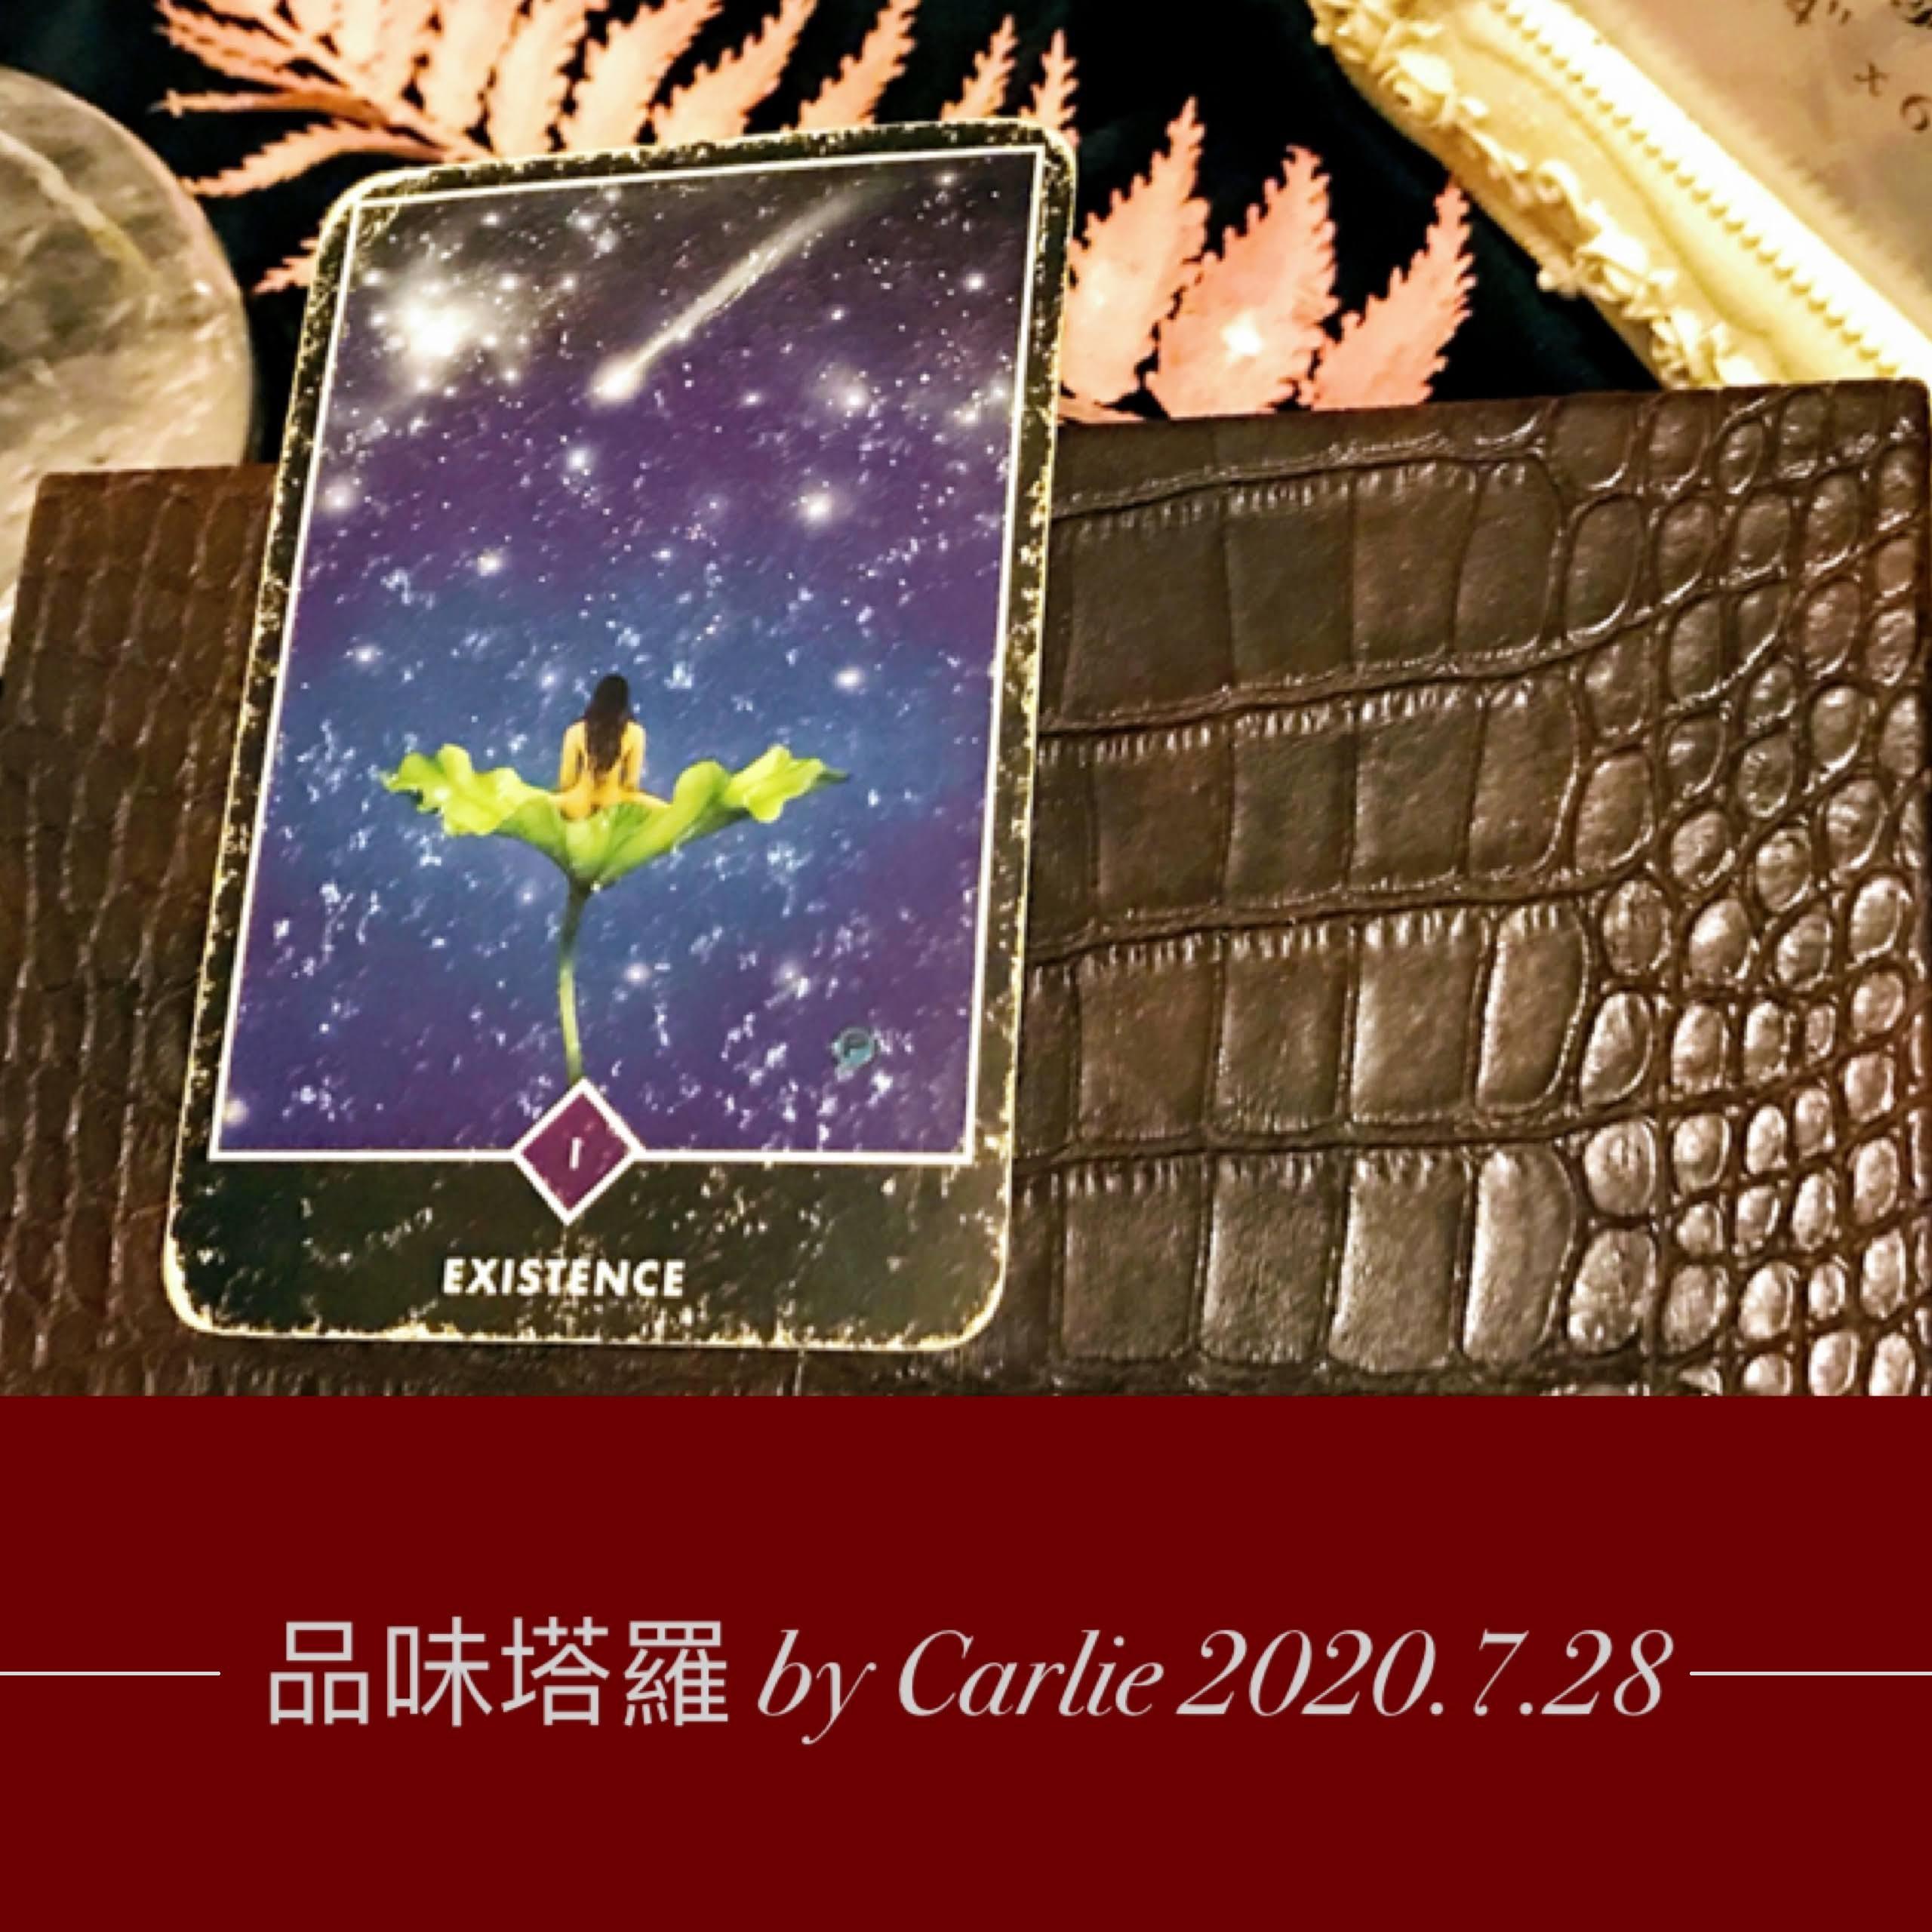 獨立自主塔羅奧修禪卡香港 hongkong osho zen tarot existence